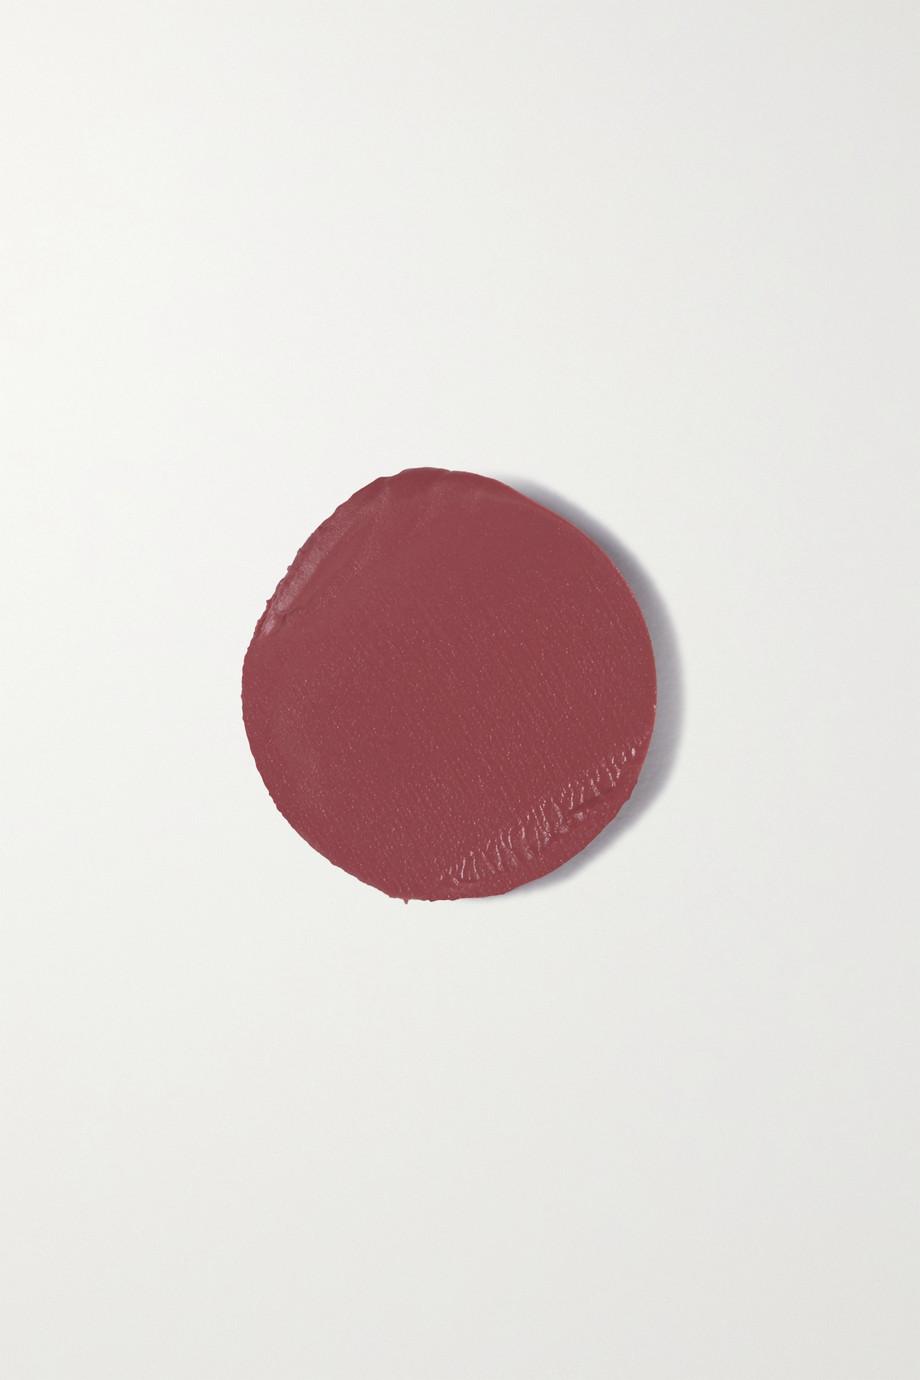 Victoria Beckham Beauty Posh Lipstick – Sway – Lippenstift